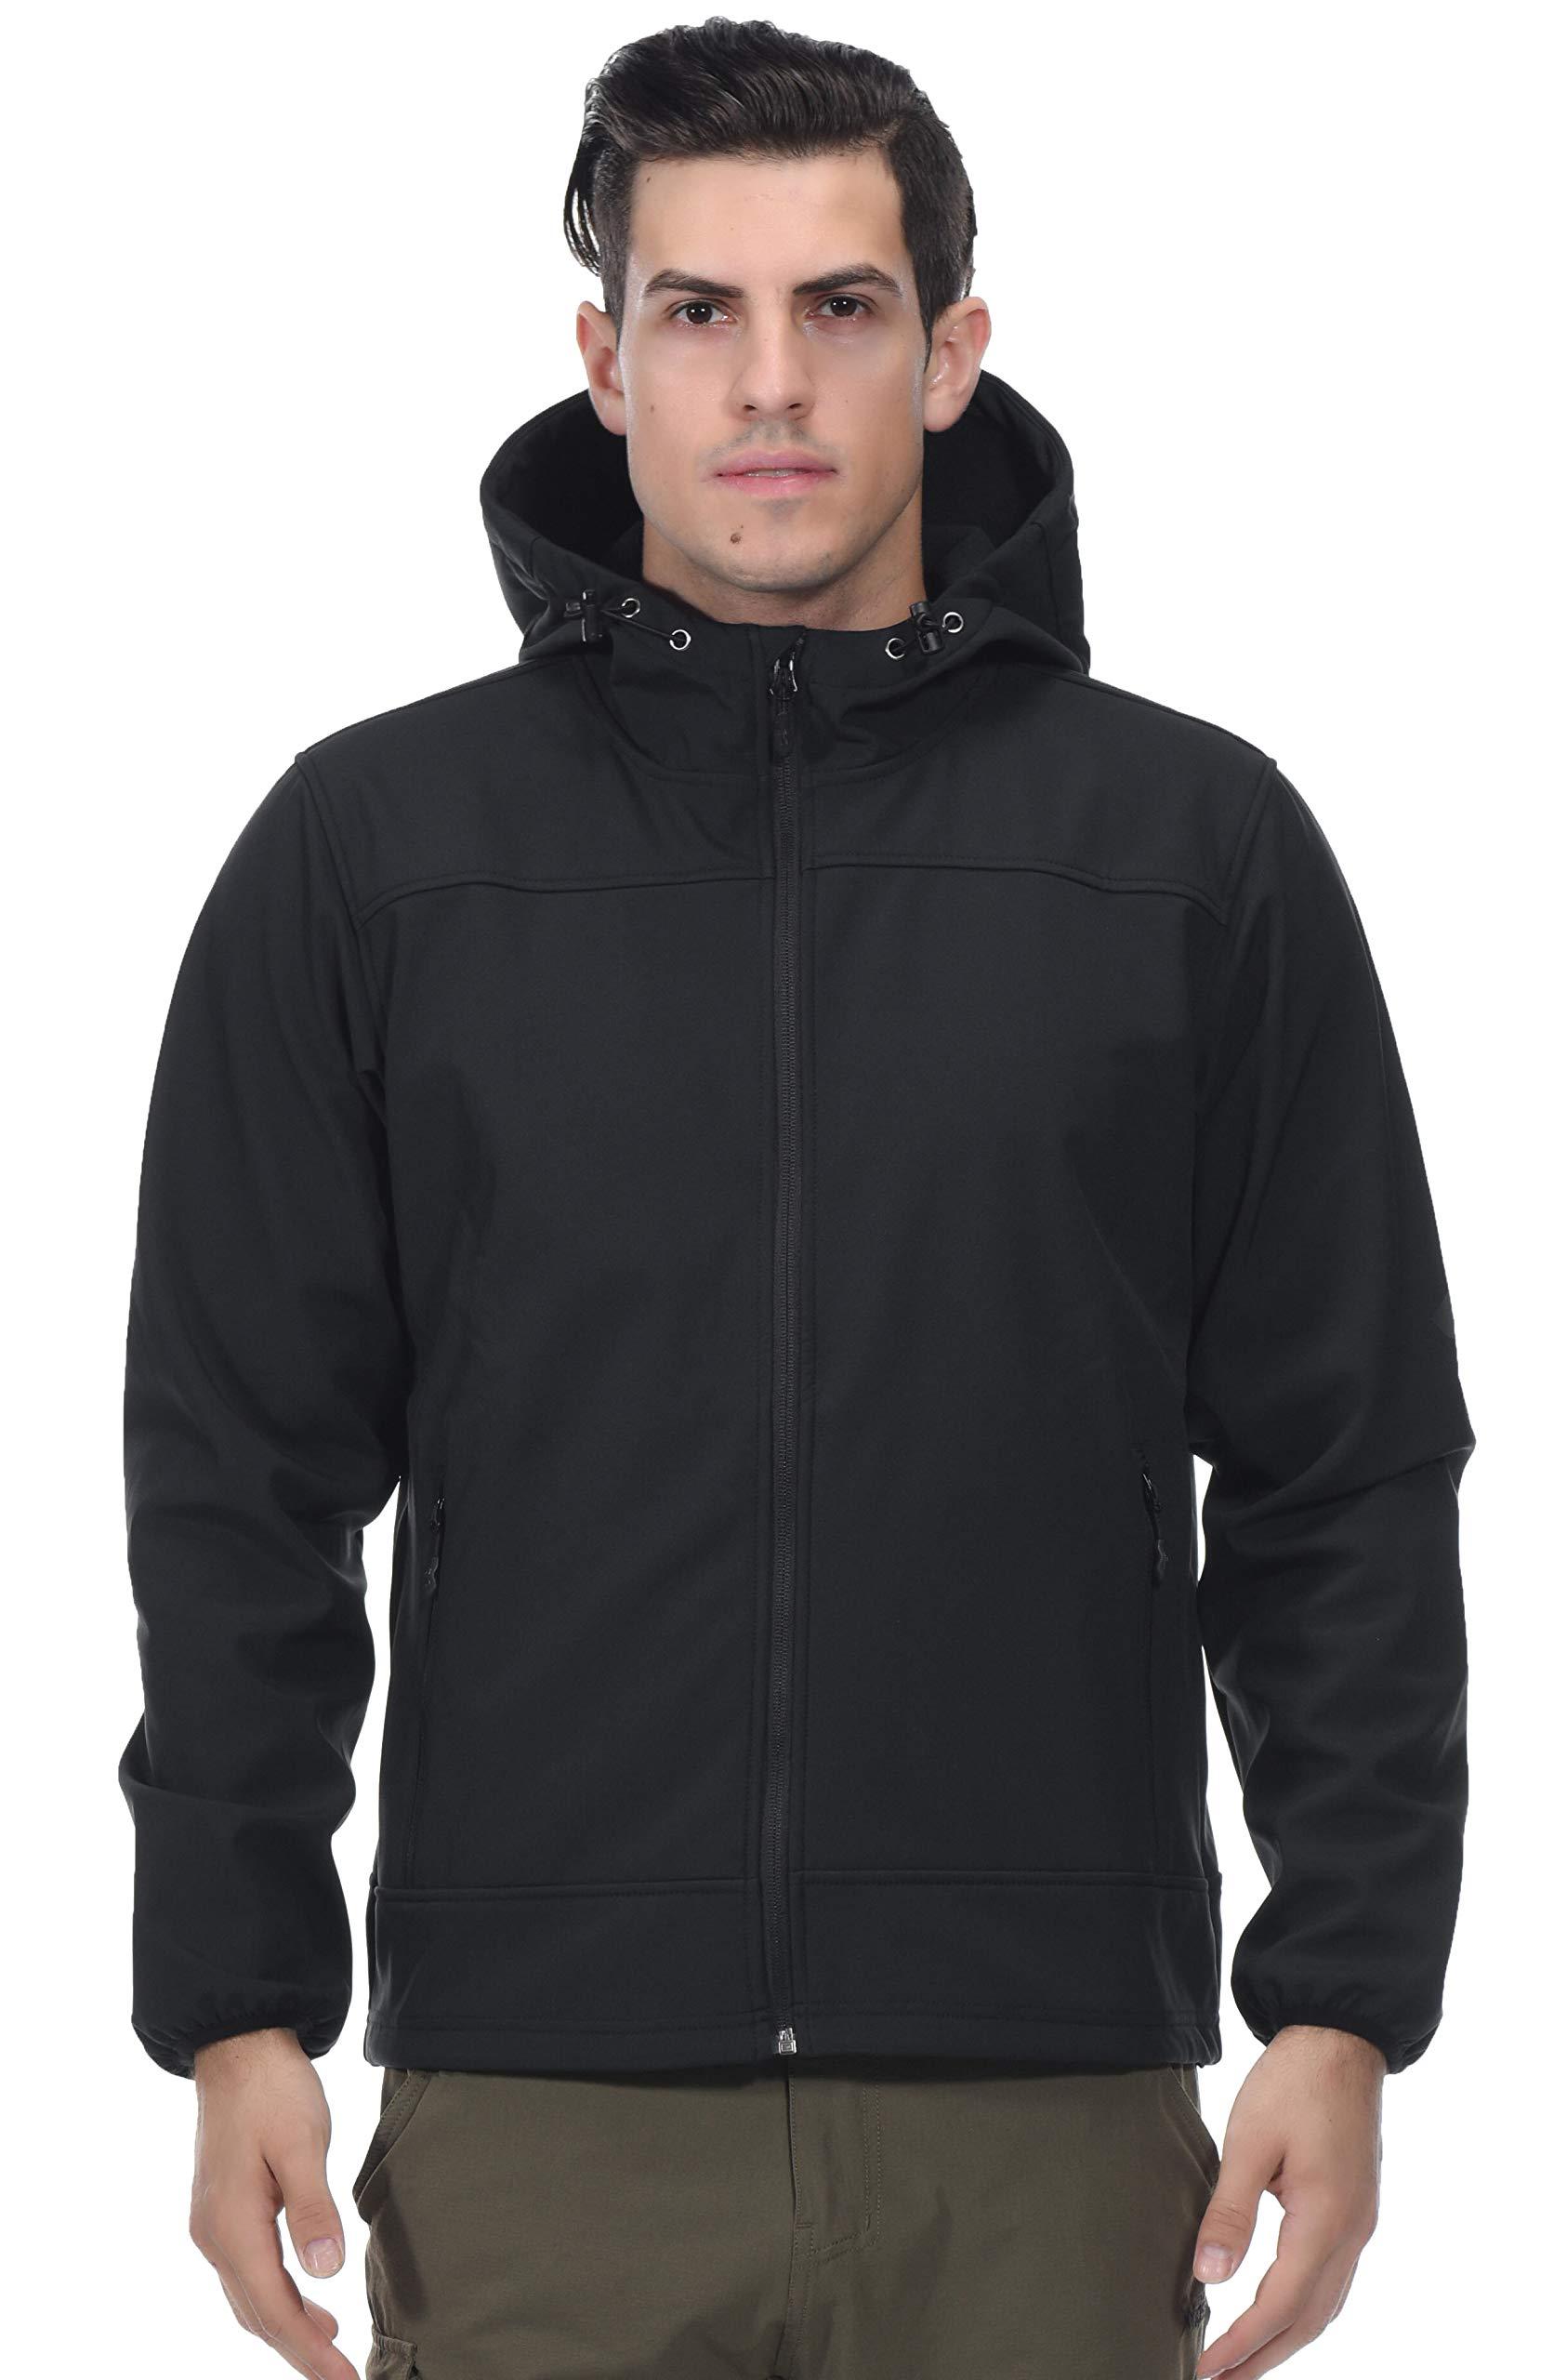 Mens Softshell Fleece-lined Jackets//Winter Outdoor Coats//Windbreaker,Medium-weight,Water-repellent TRAILSIDE SUPPLY CO